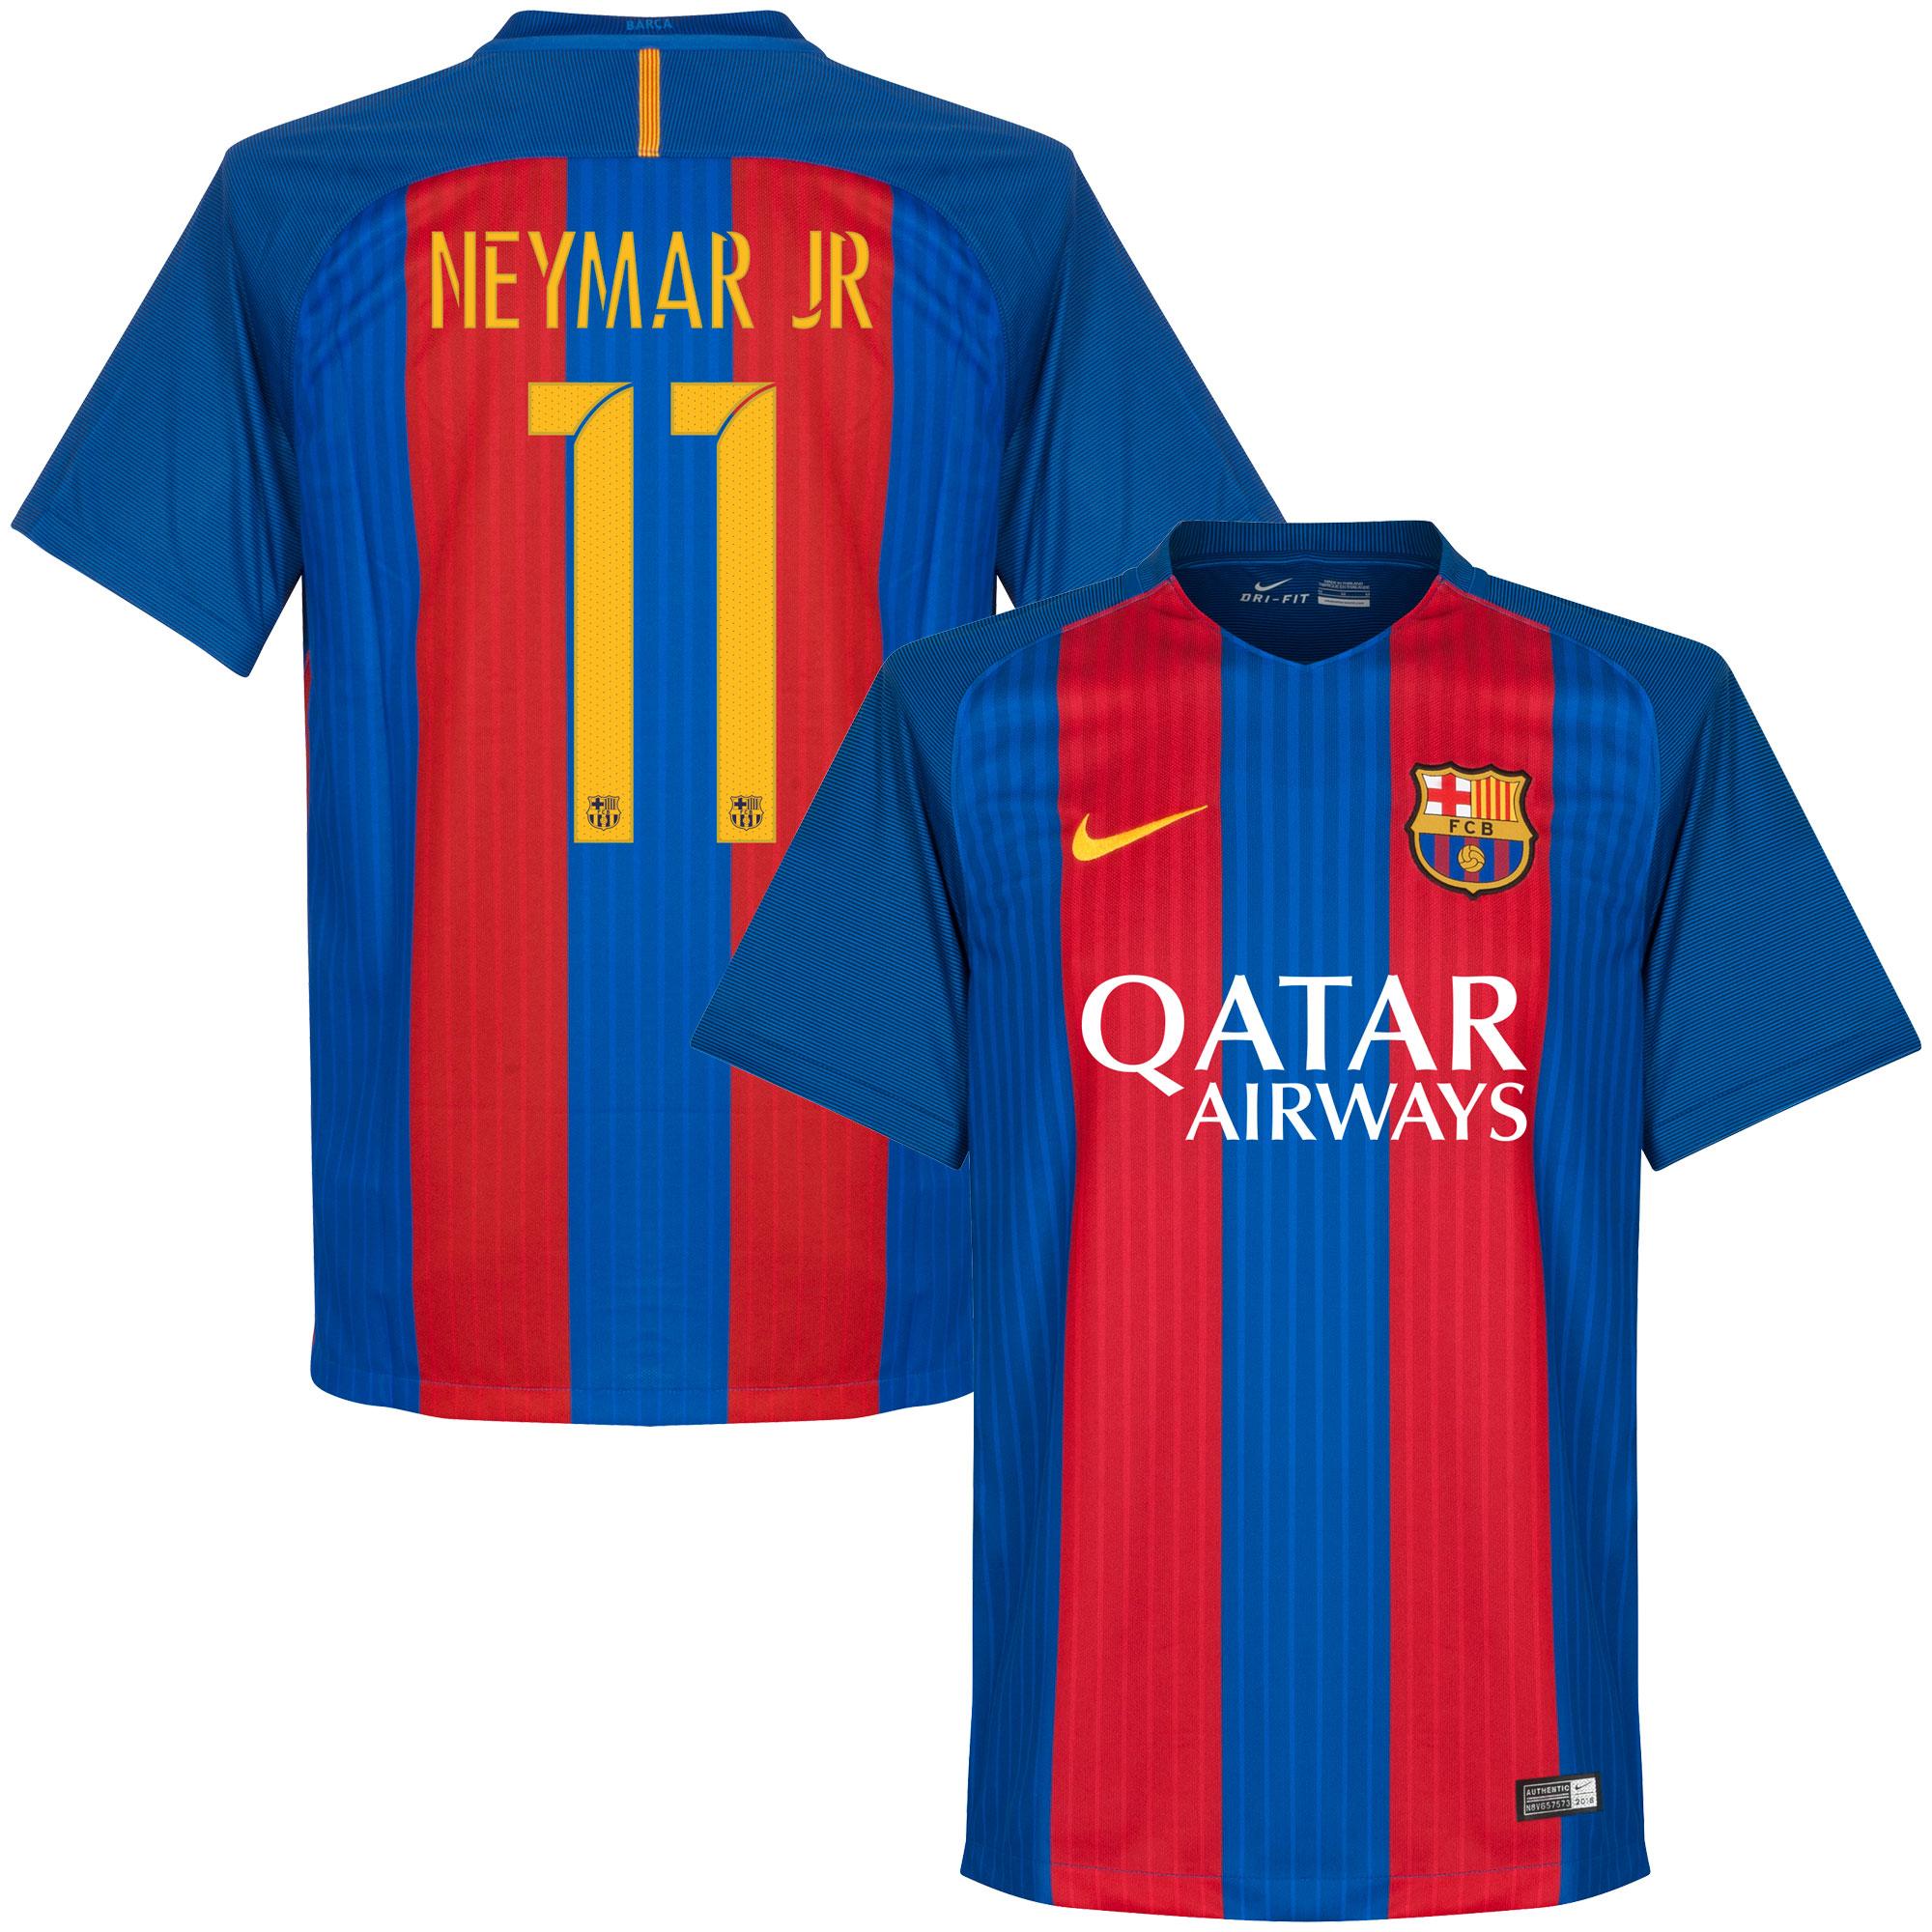 Barcelona Home Neymar Jr European Jersey 2016 / 2017 (Official Player Printing) - M